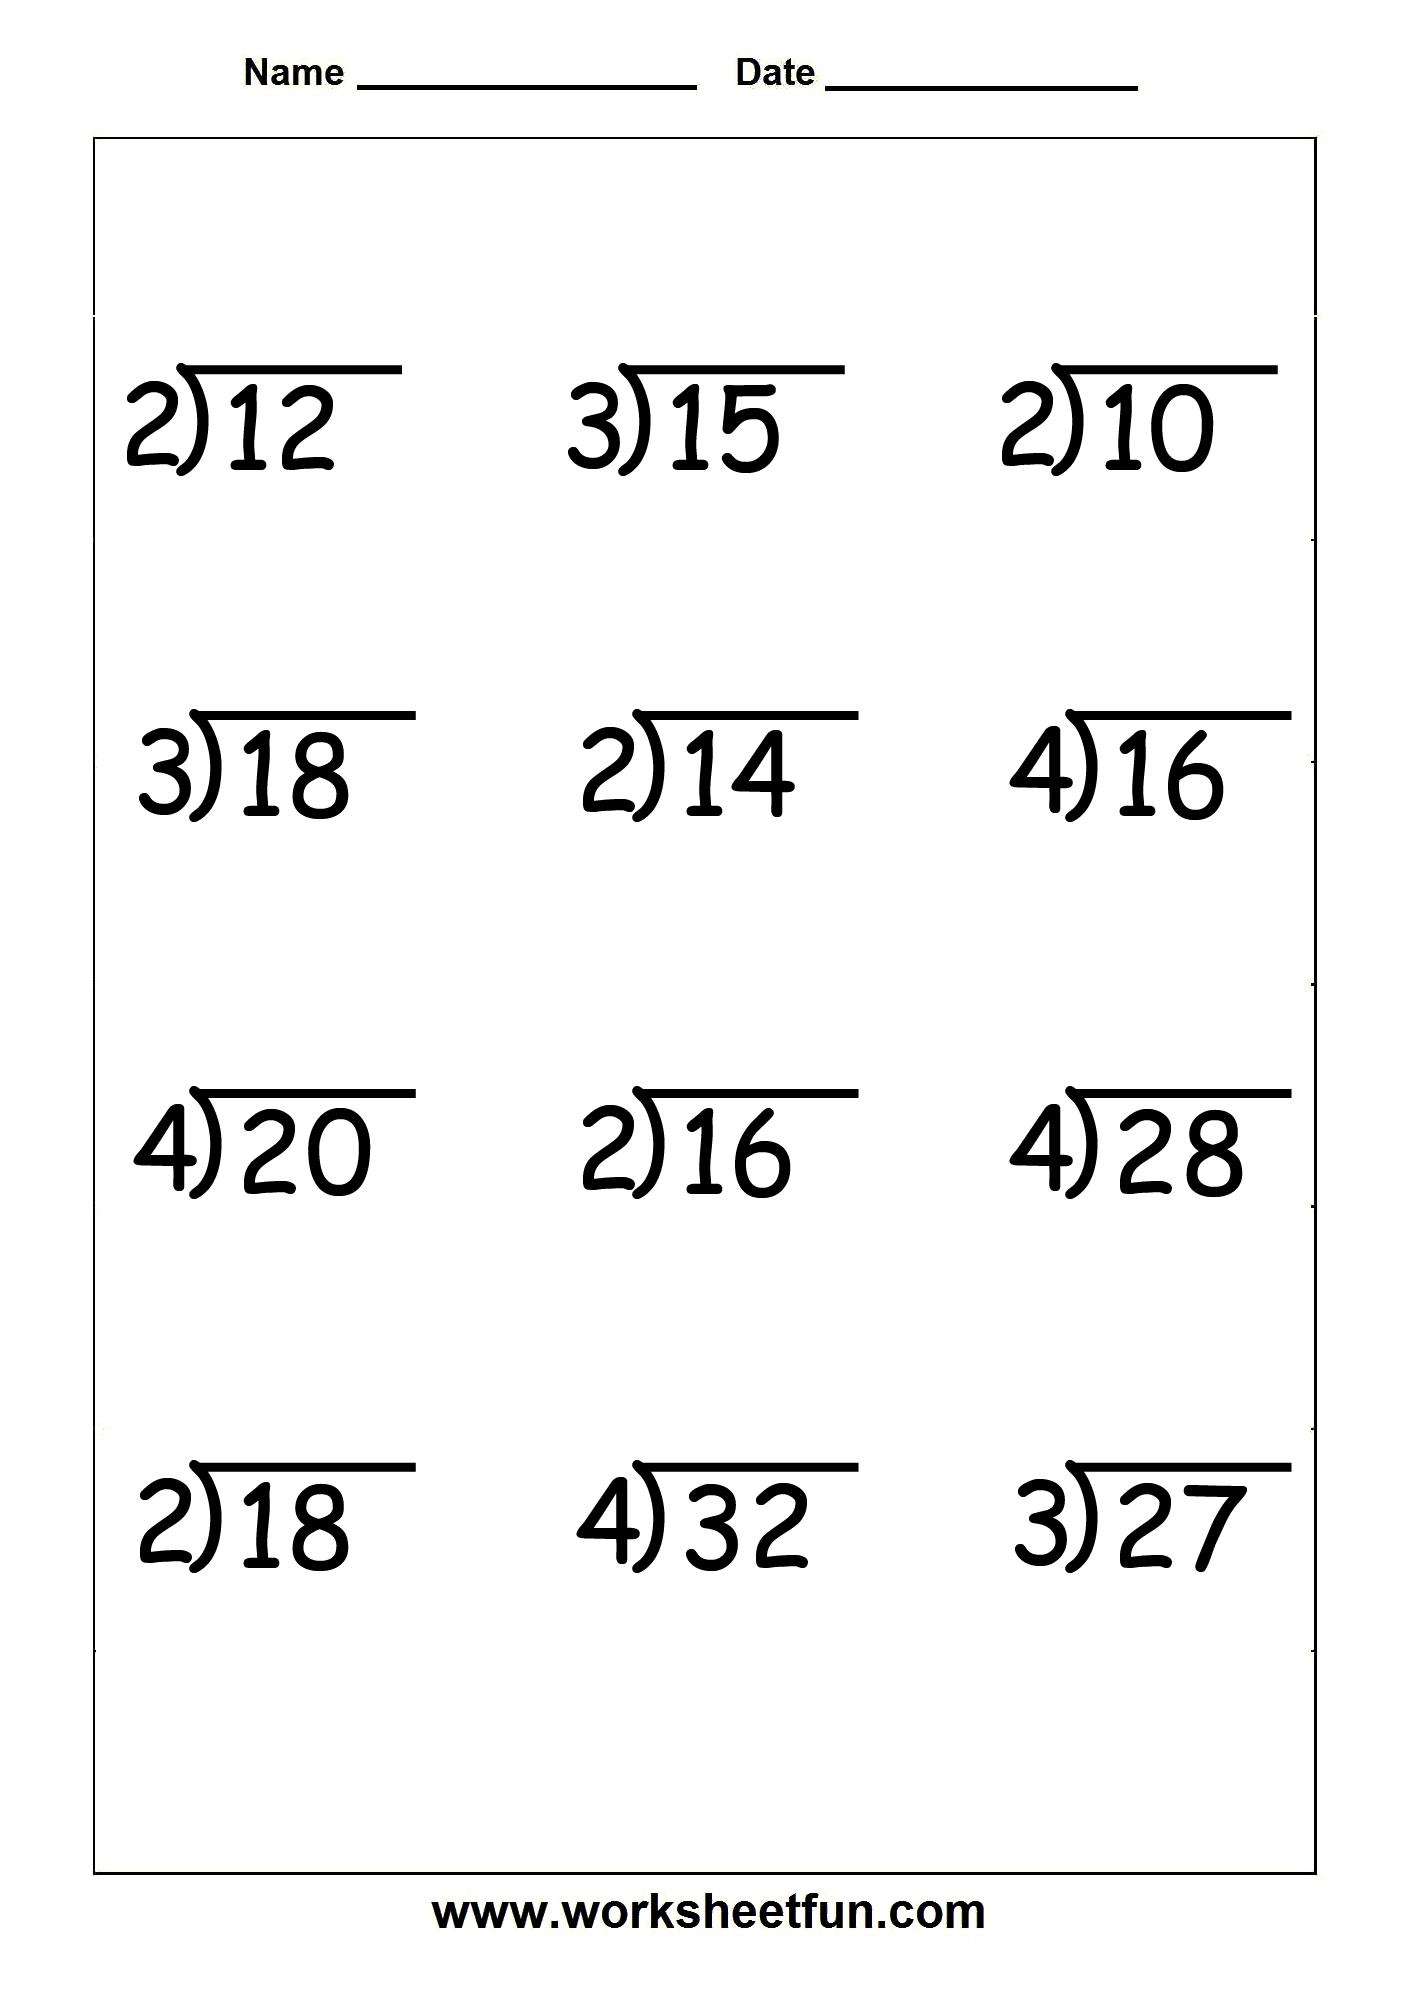 Division - 9 Worksheets   Printable math worksheets [ 1989 x 1405 Pixel ]